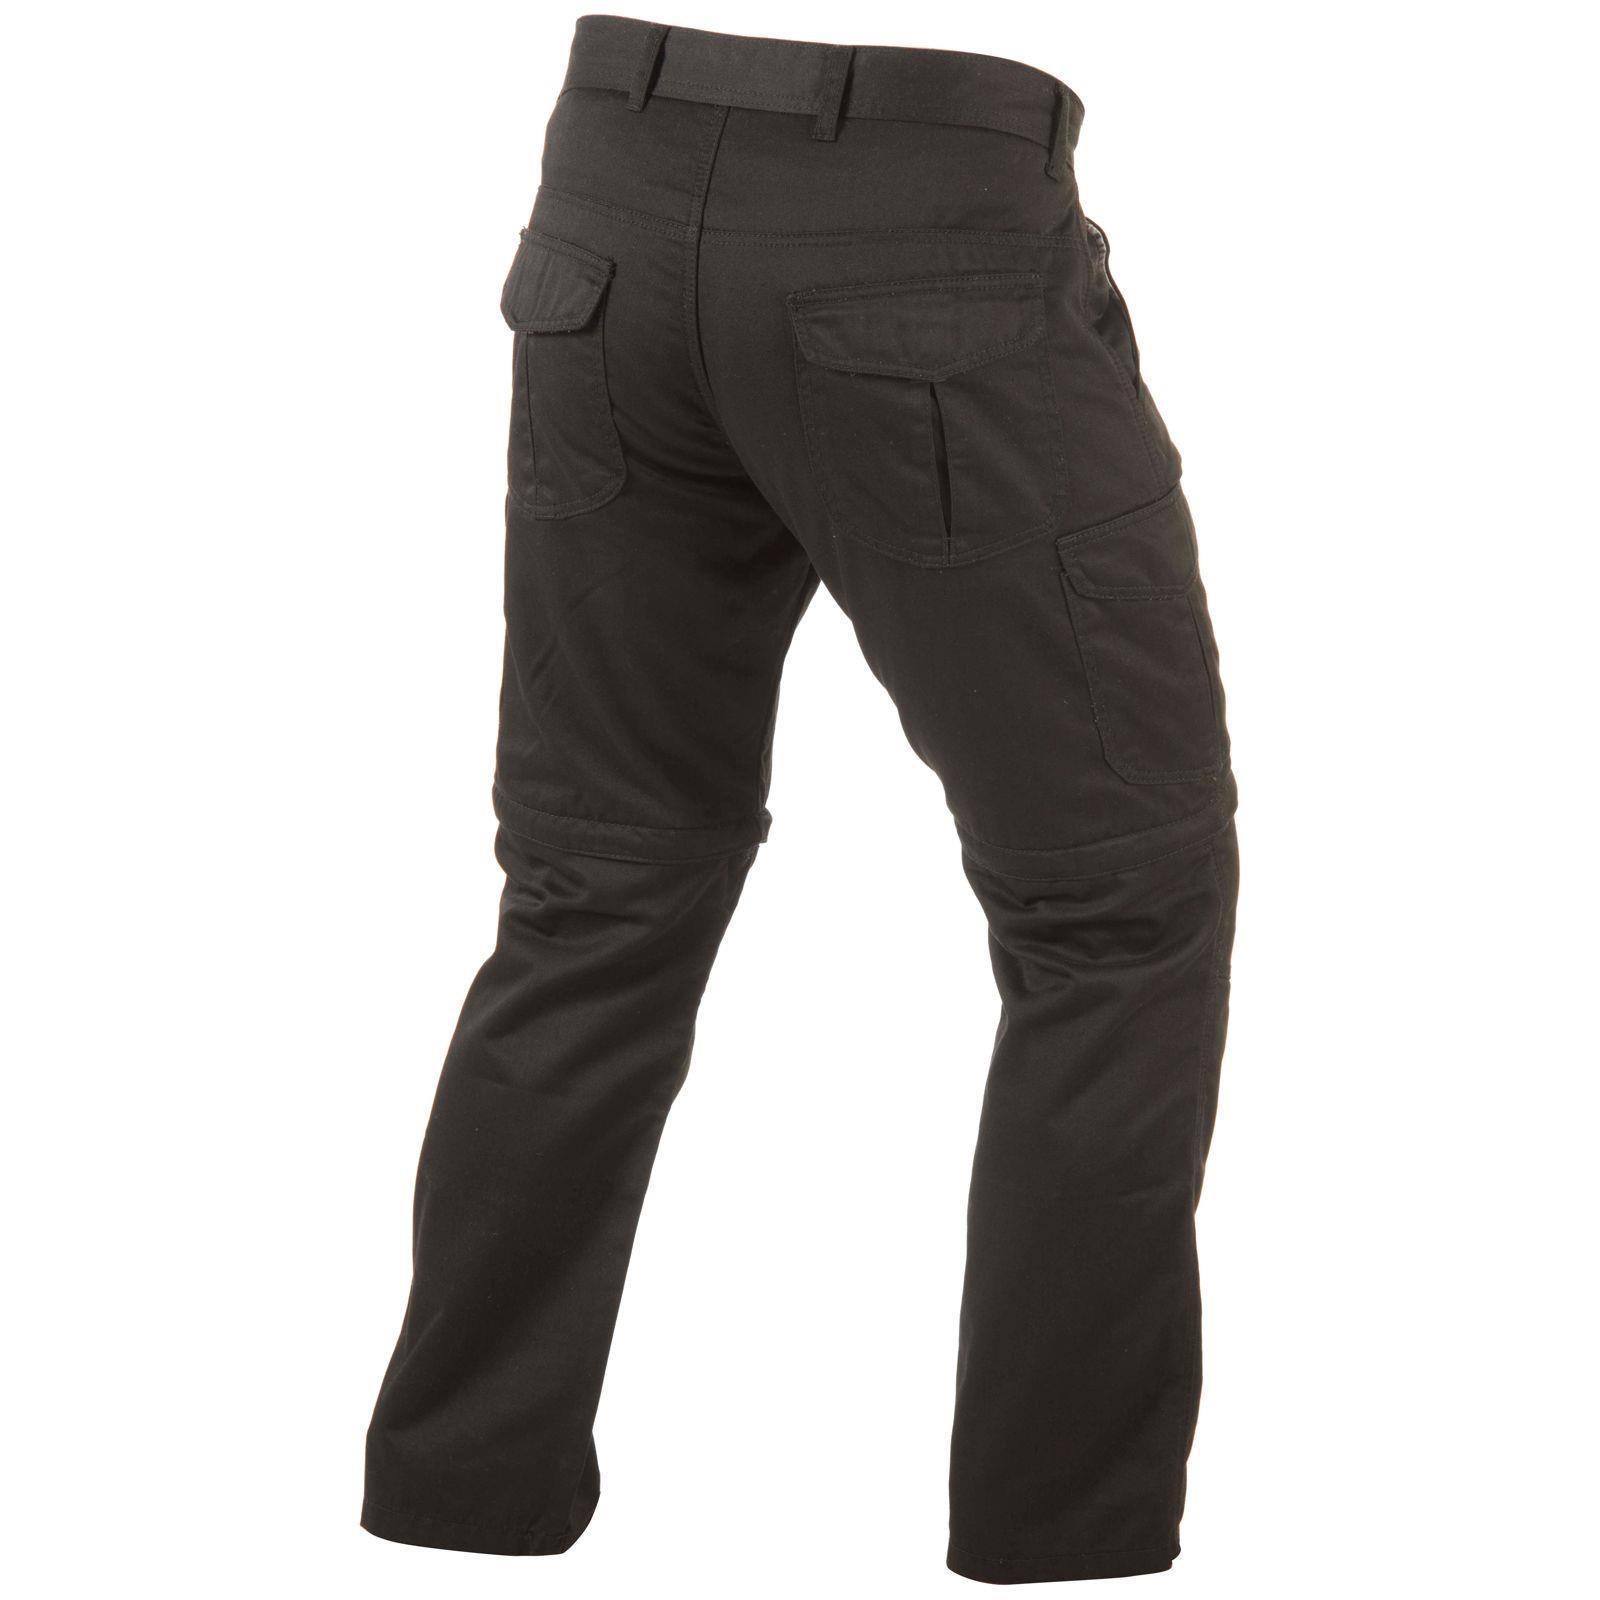 Trilobite-Pantaloni-Moto-Jeans-Abbigliamento-Parado-MICAS-URBAN-DUAL-PANTS-ACID miniatura 61